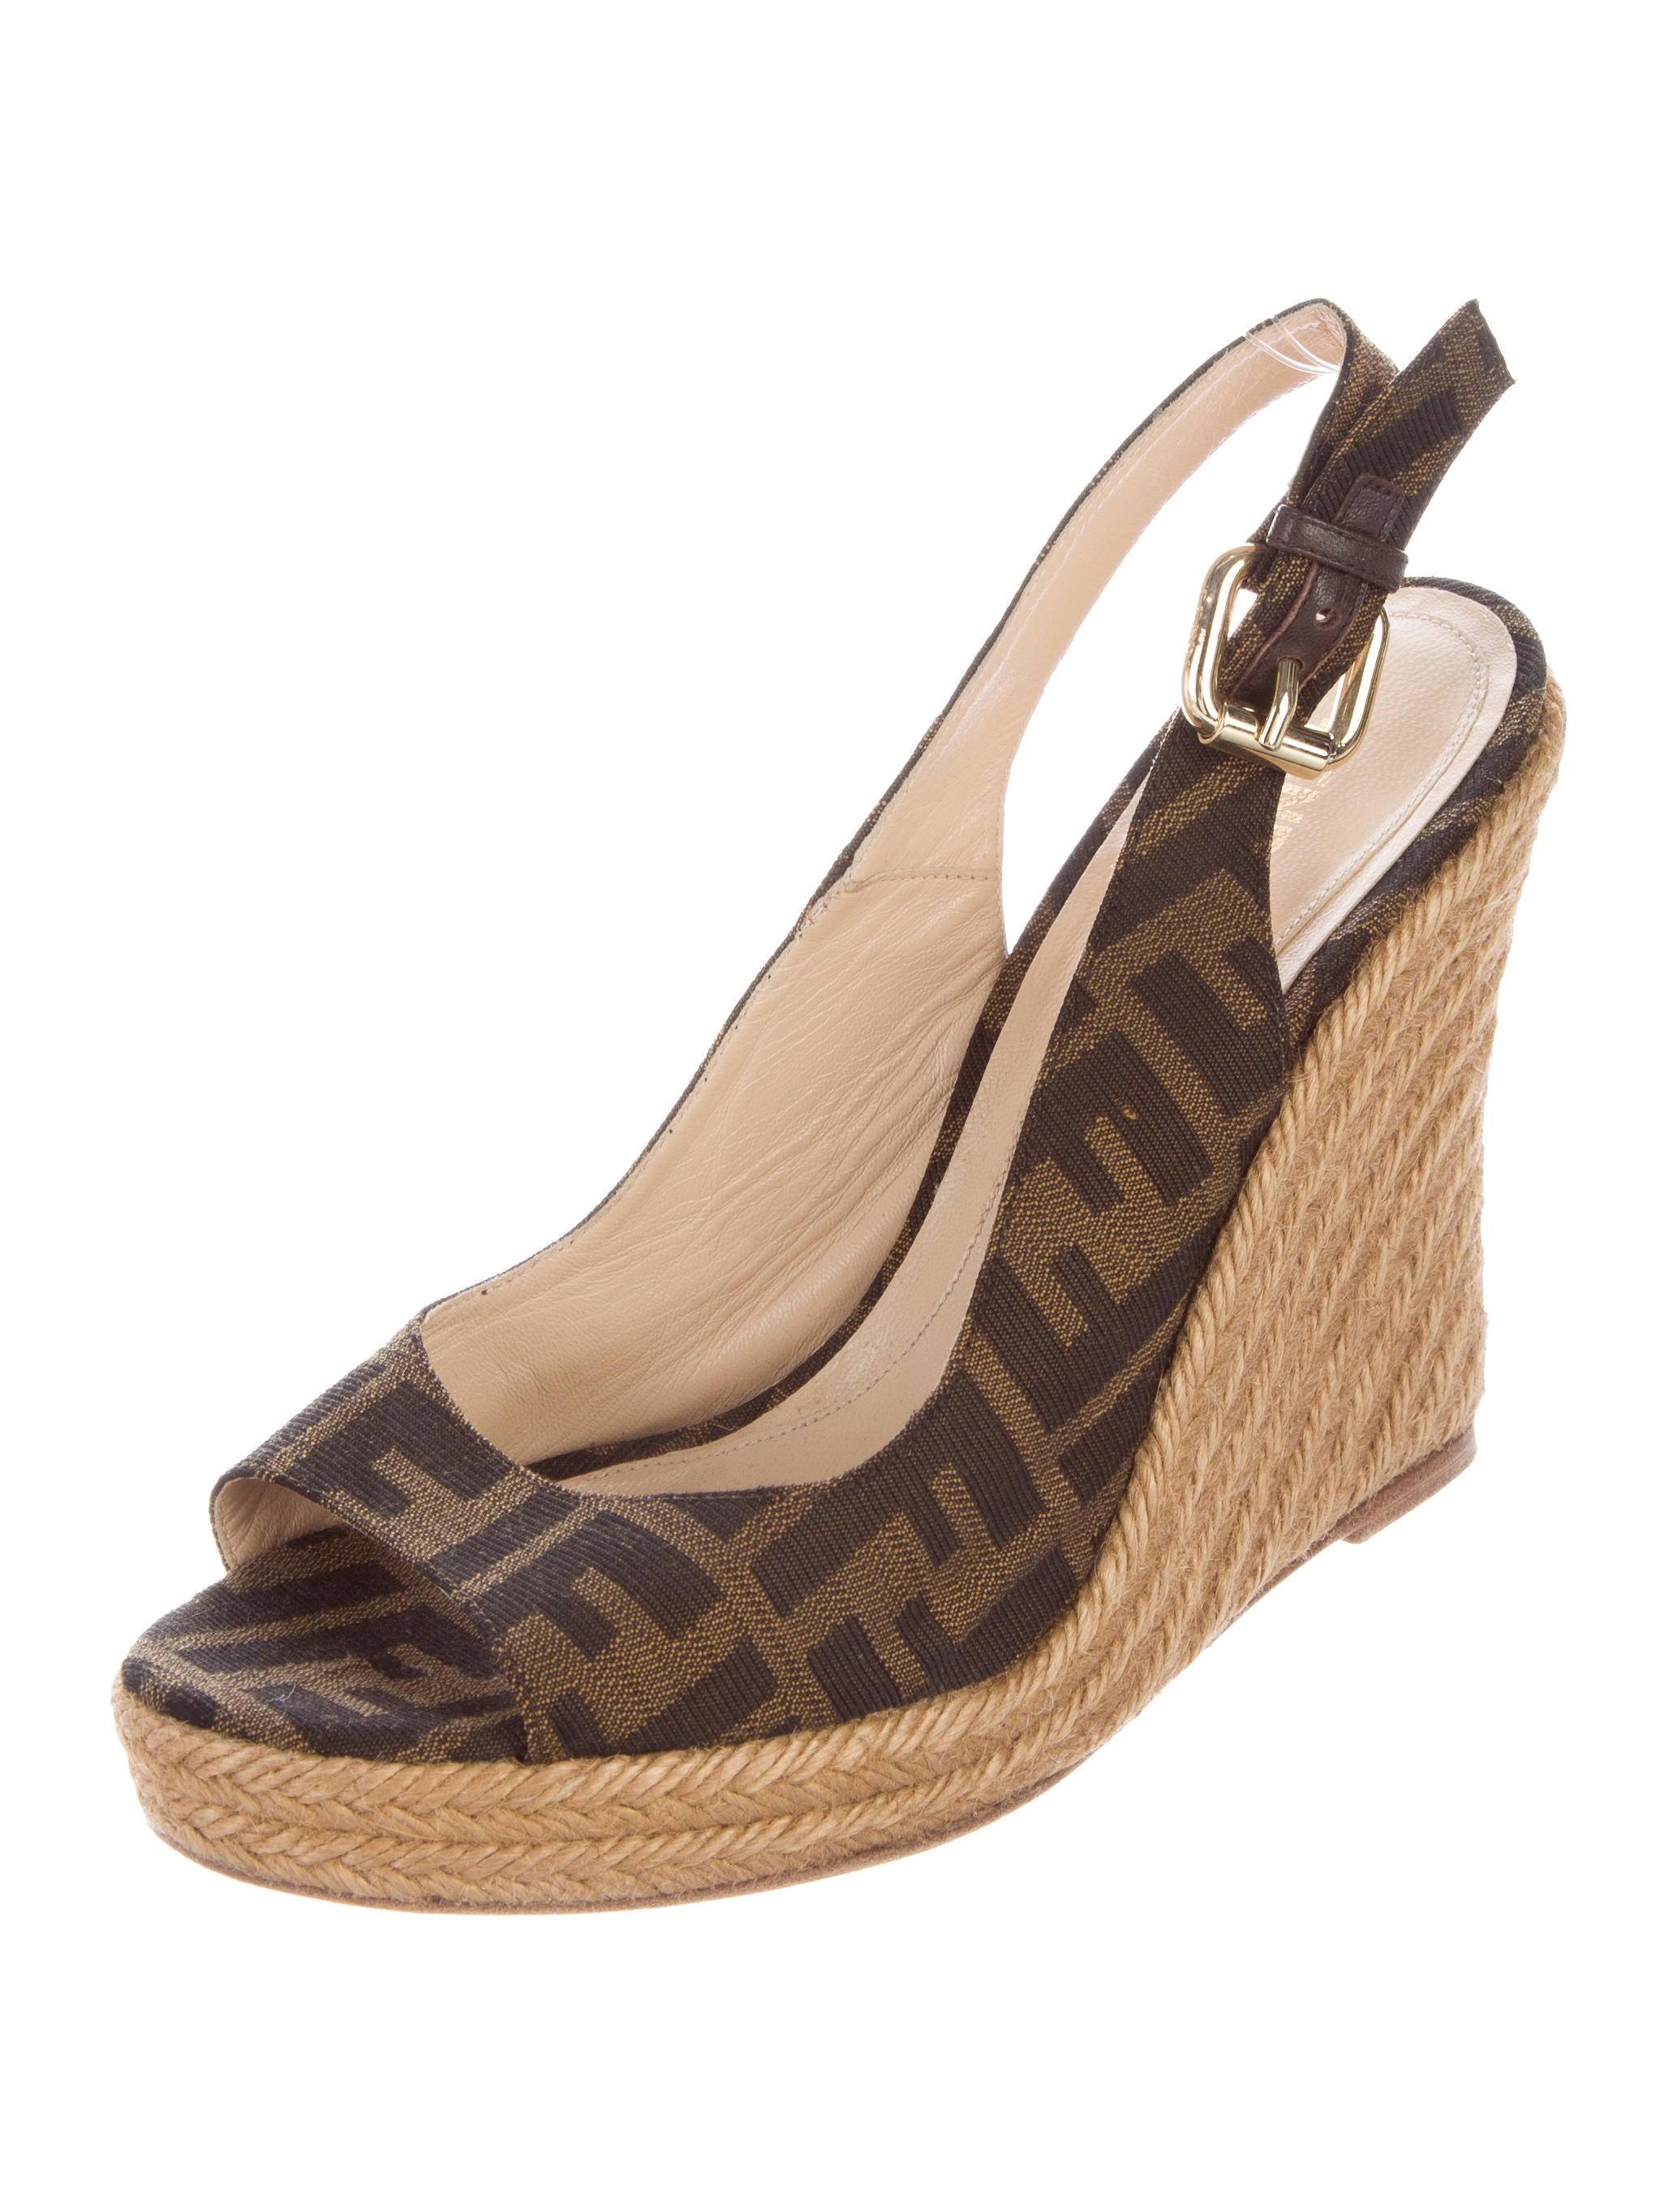 fendi zucca slingback espadrille wedges shoes fen60277